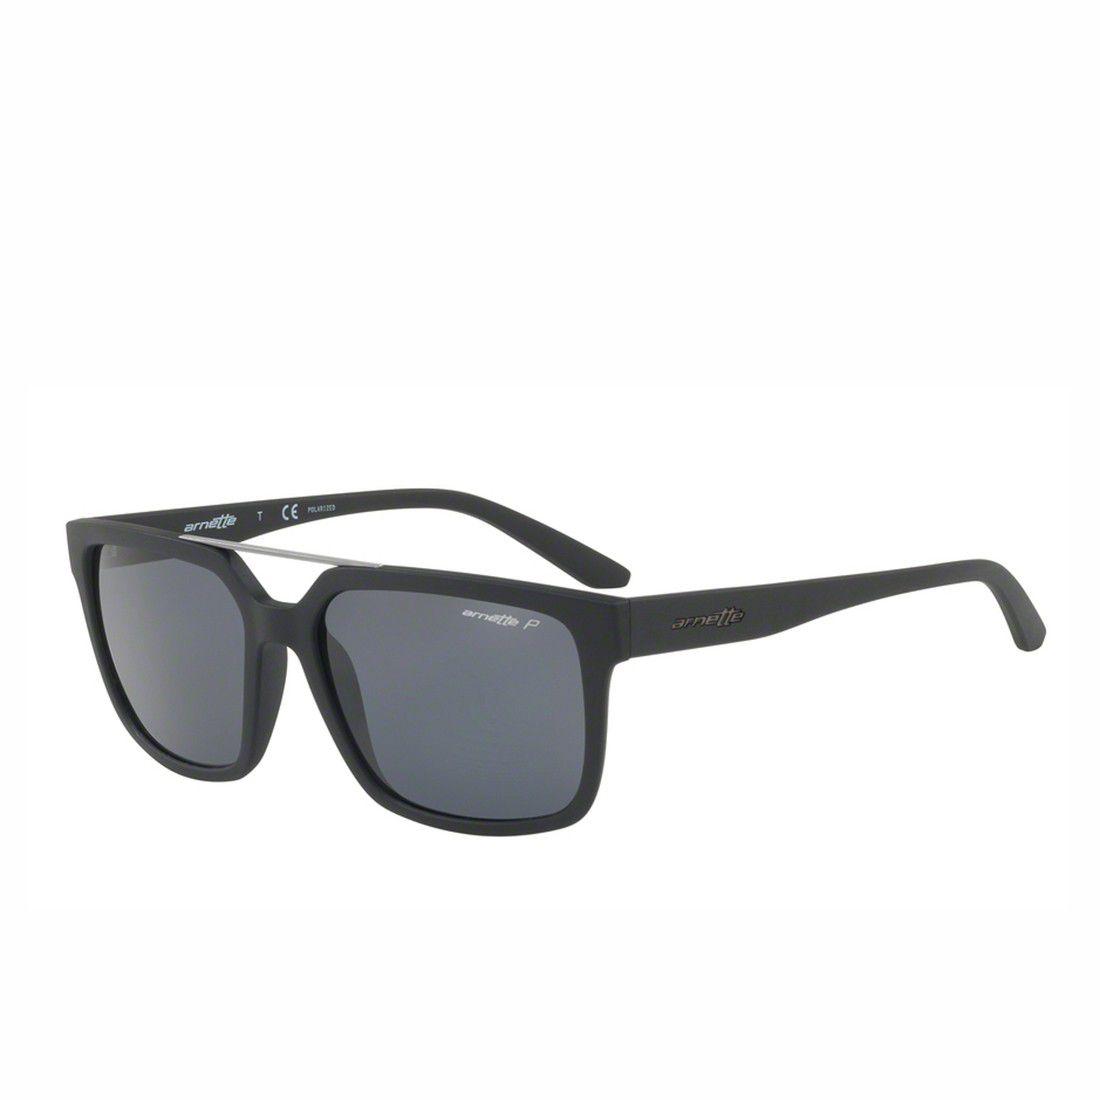 49c2b94c8b55b Óculos de Sol Arnette Masculino Petrolhead 4231-01 81 - Omega Ótica ...